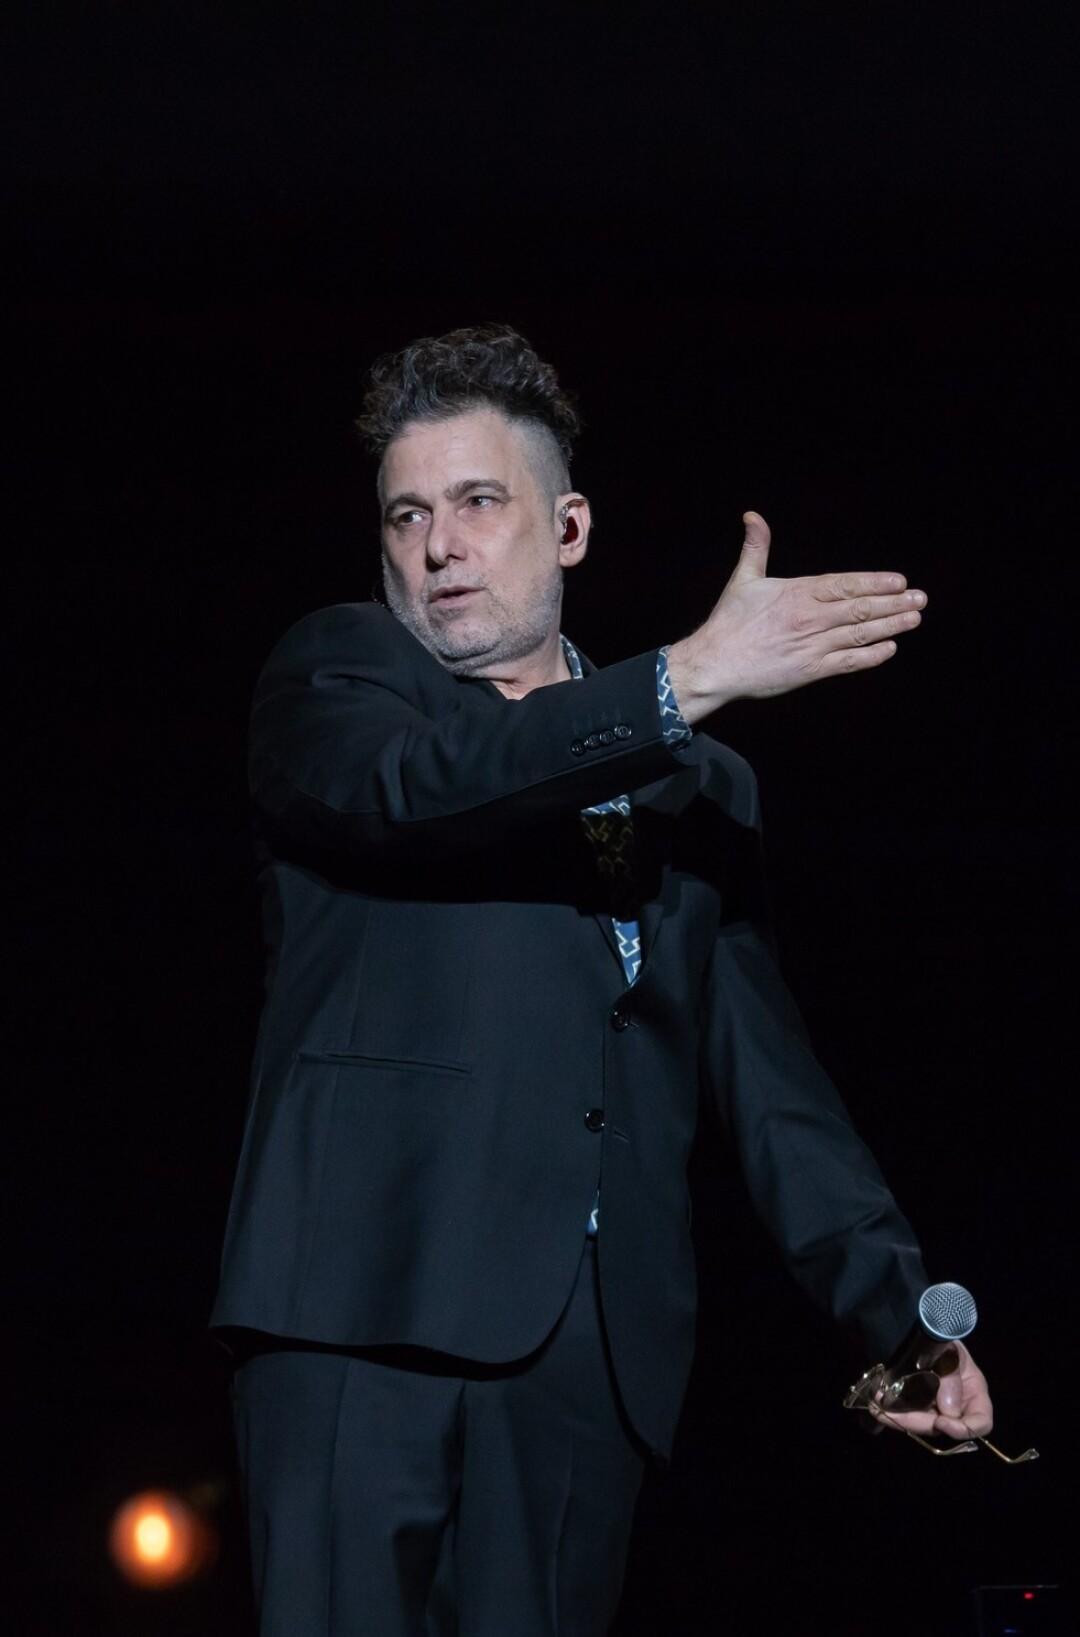 Calamaro during one of his live performances.